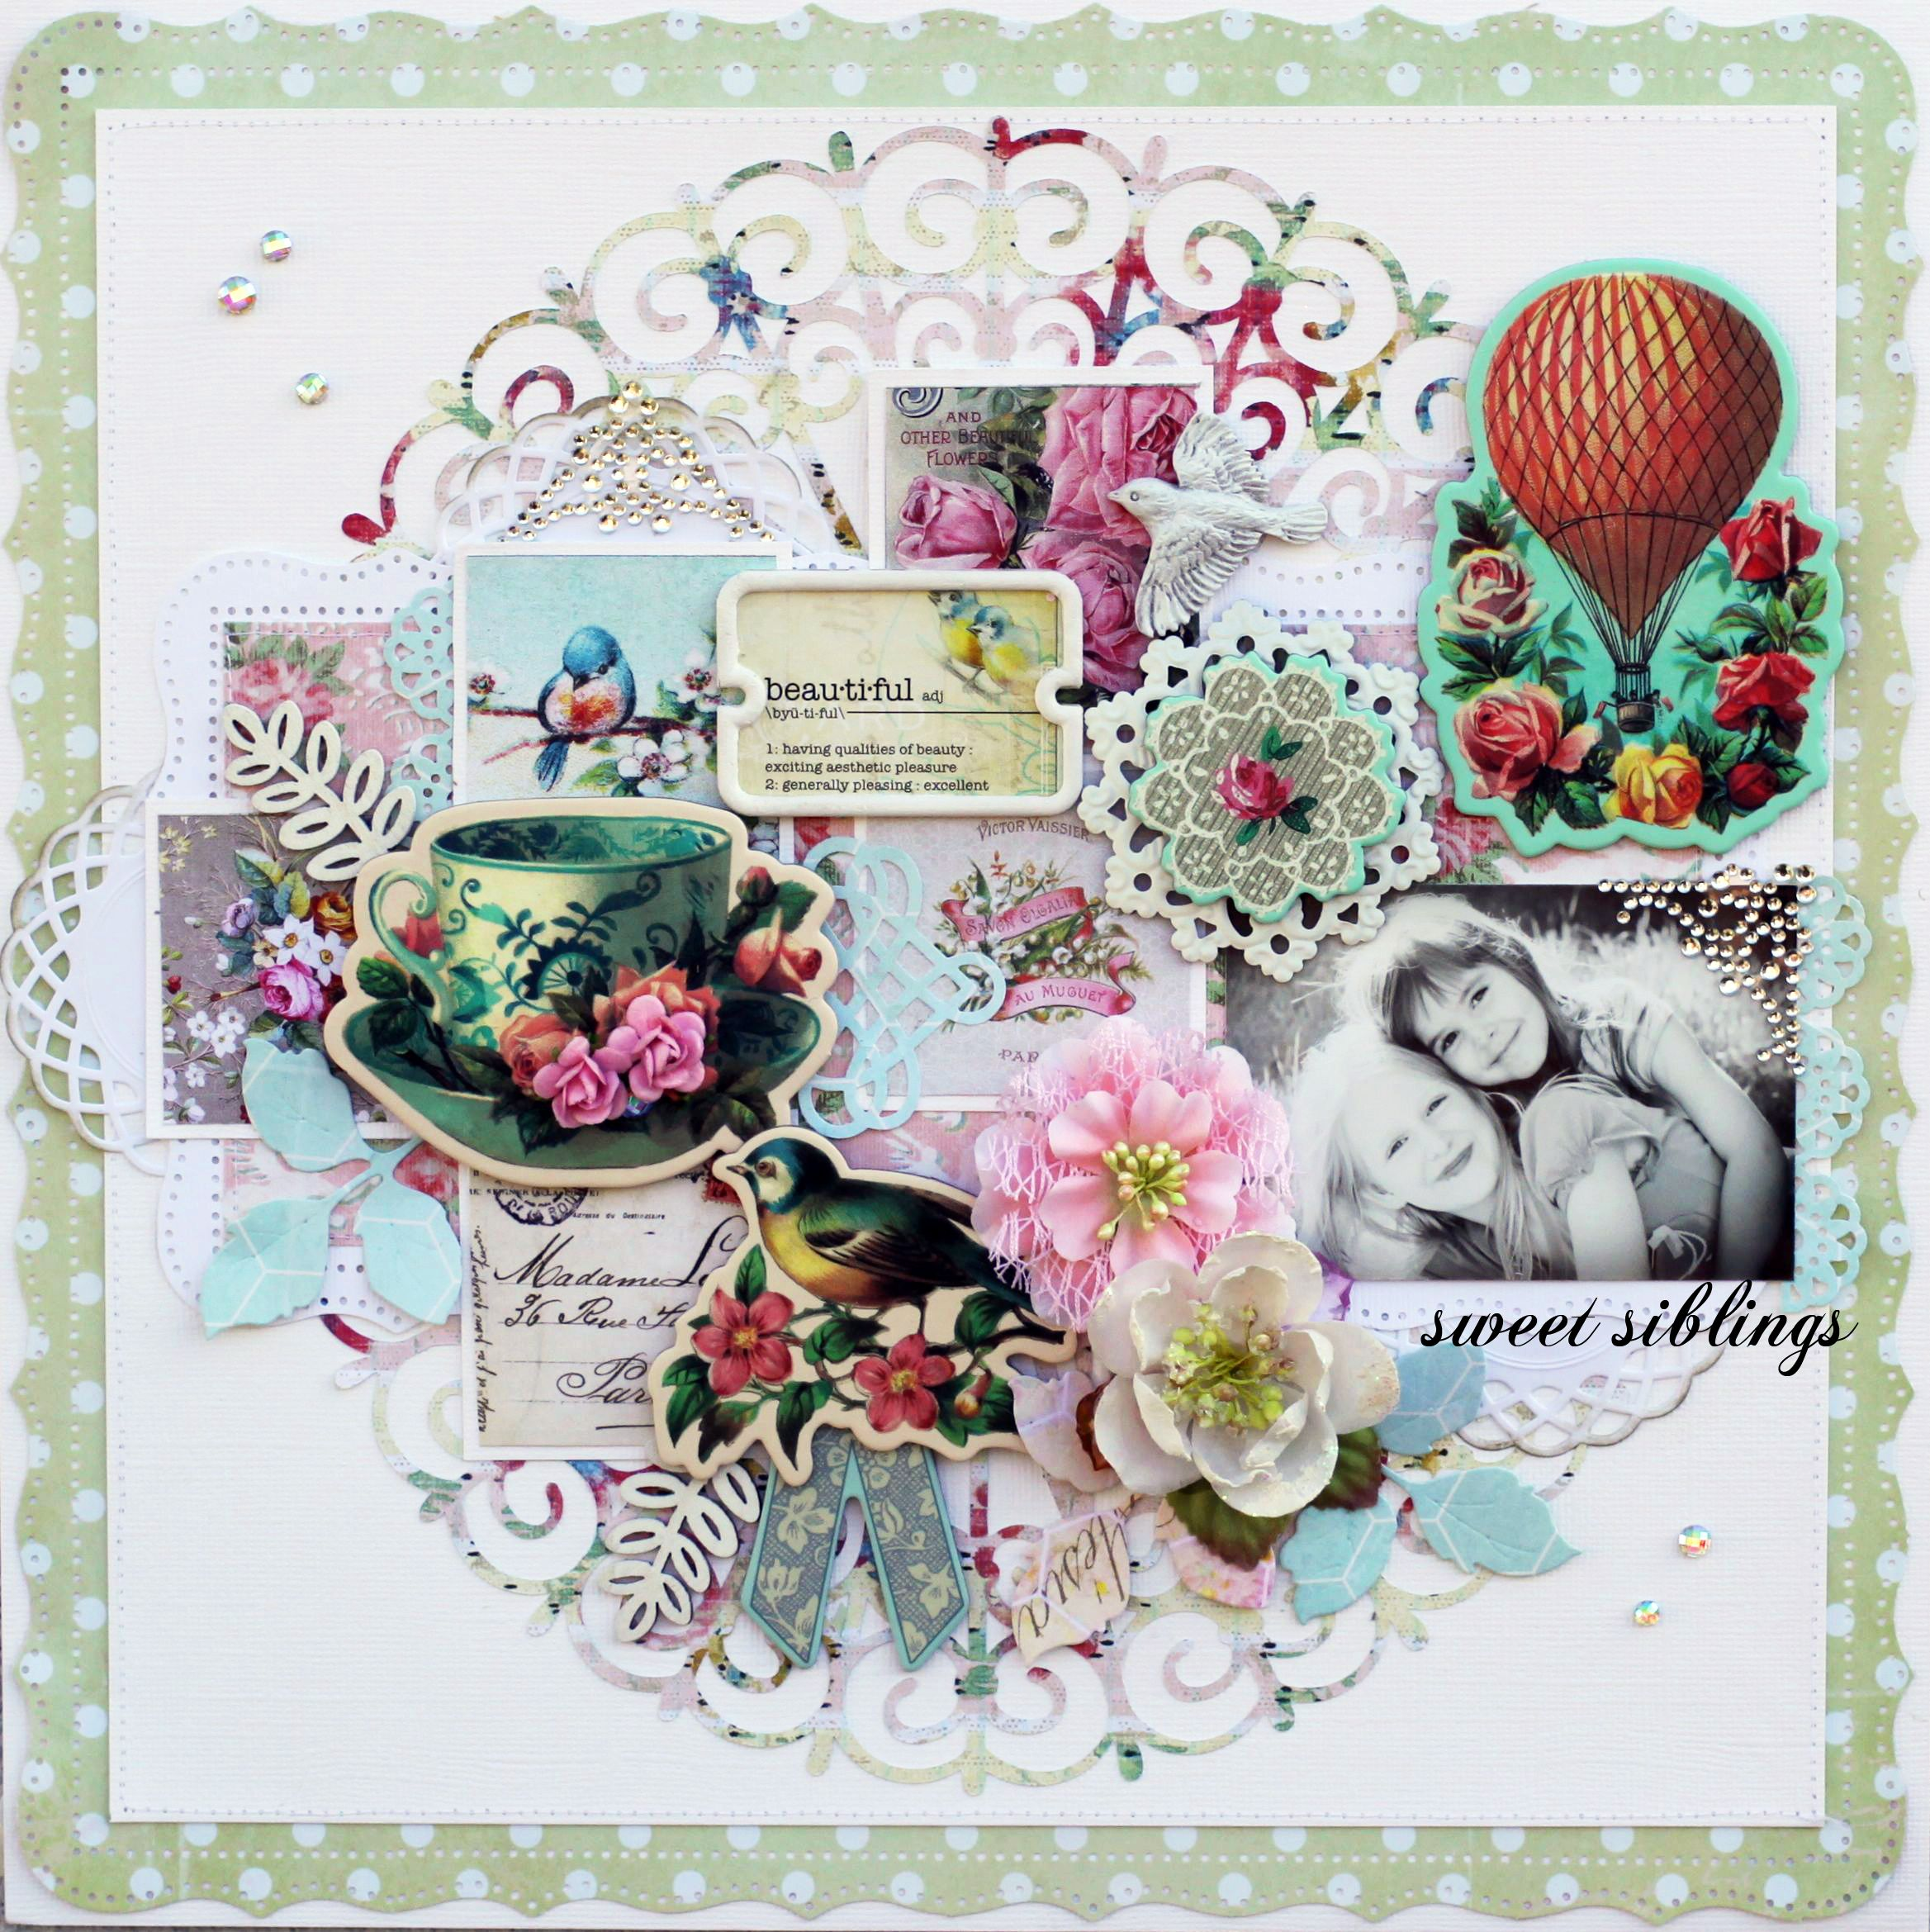 Sweet Darlings for Prima Marketing by Steph Devlin - Scrapbook.com